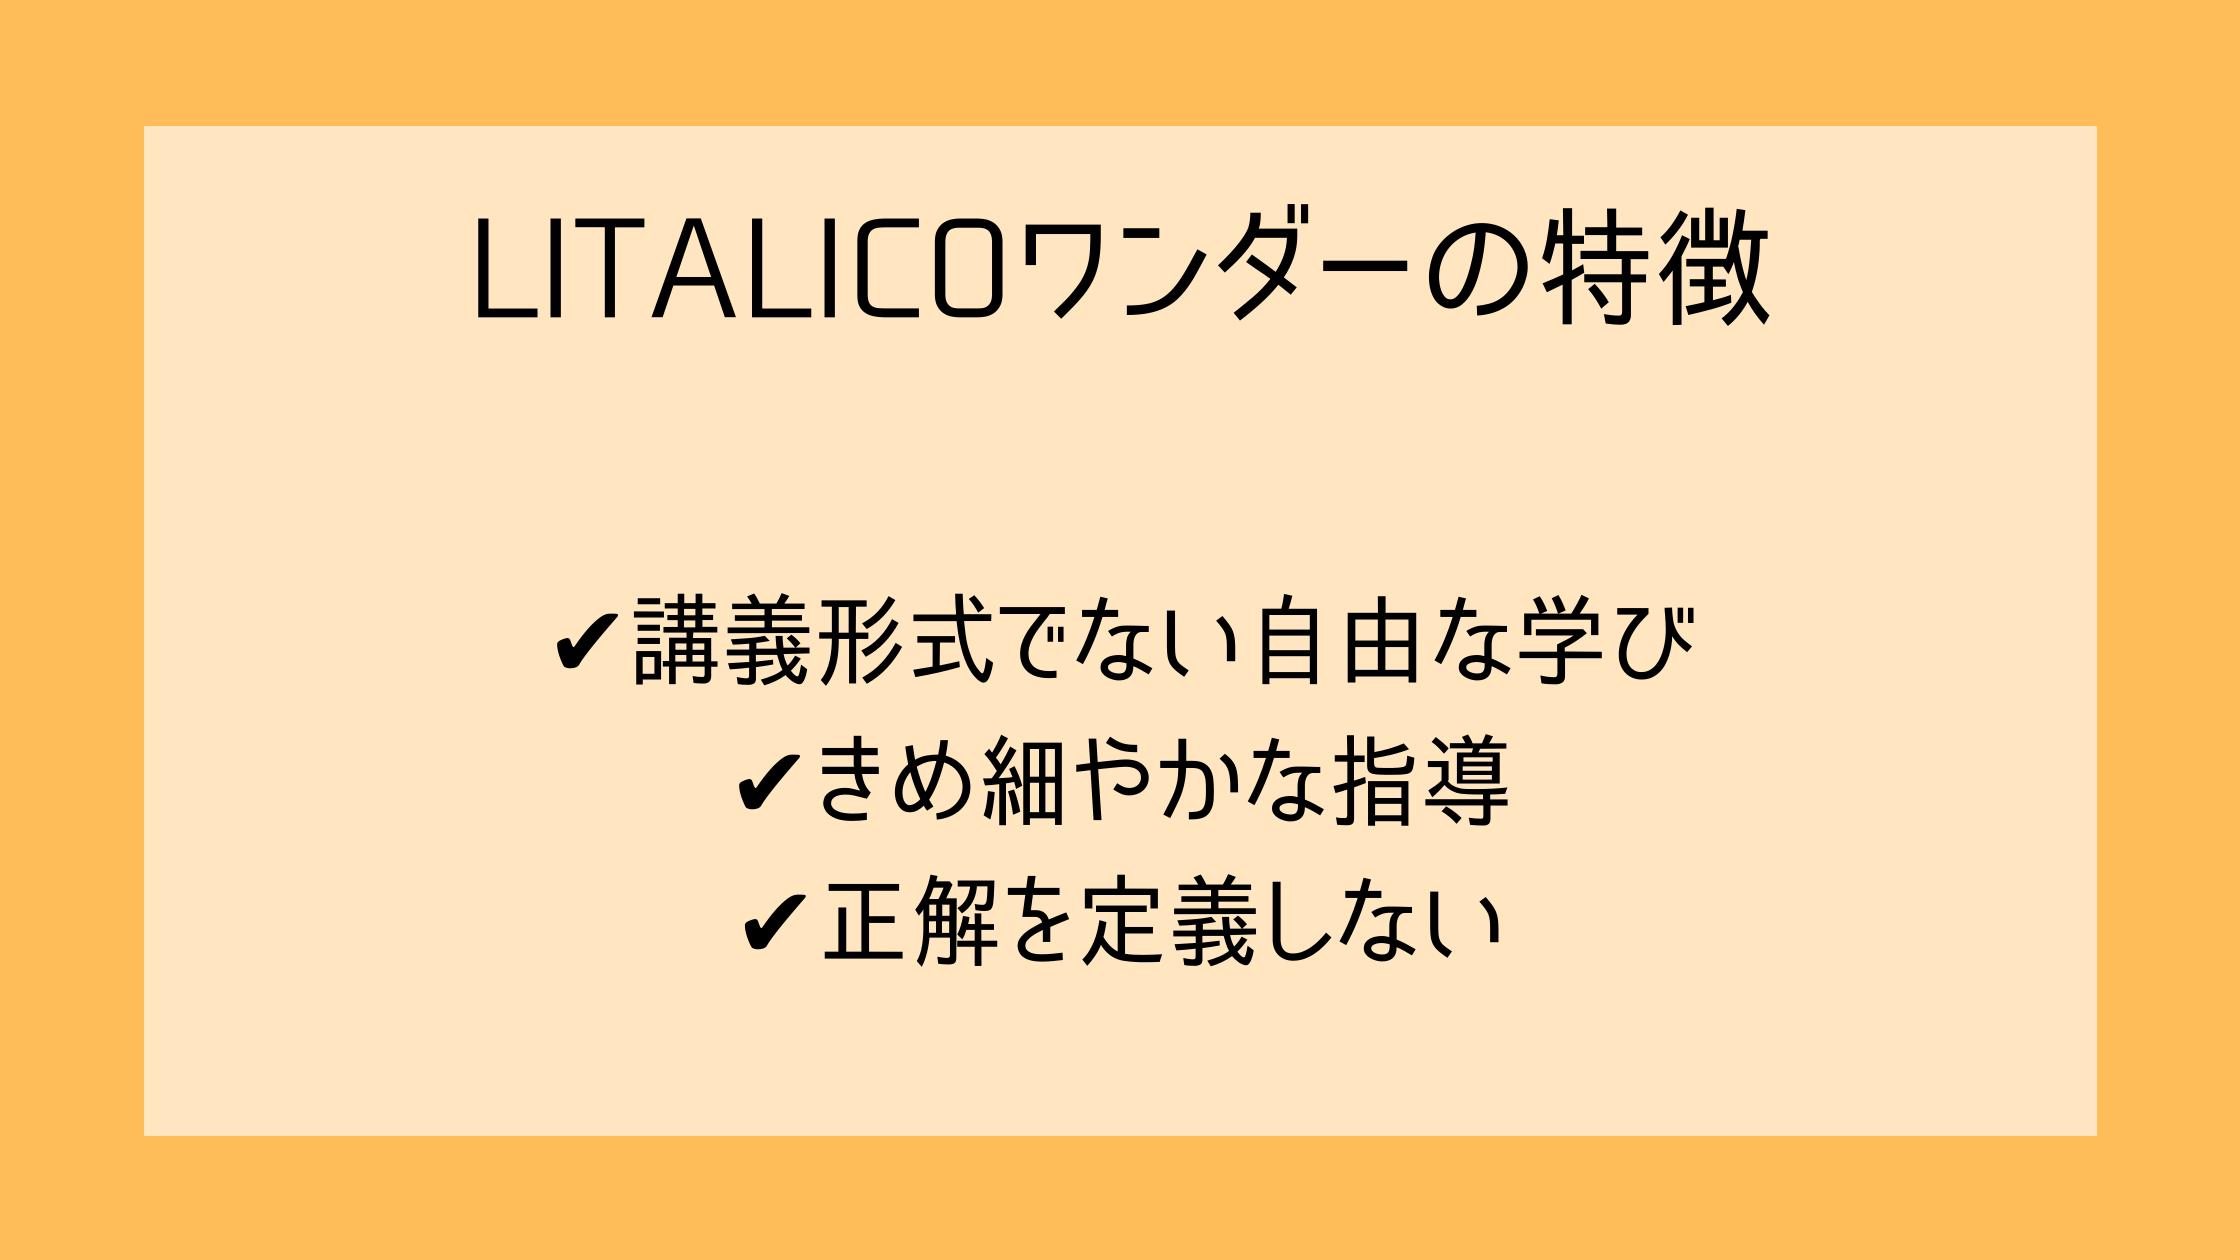 LITALICOワンダーの特徴